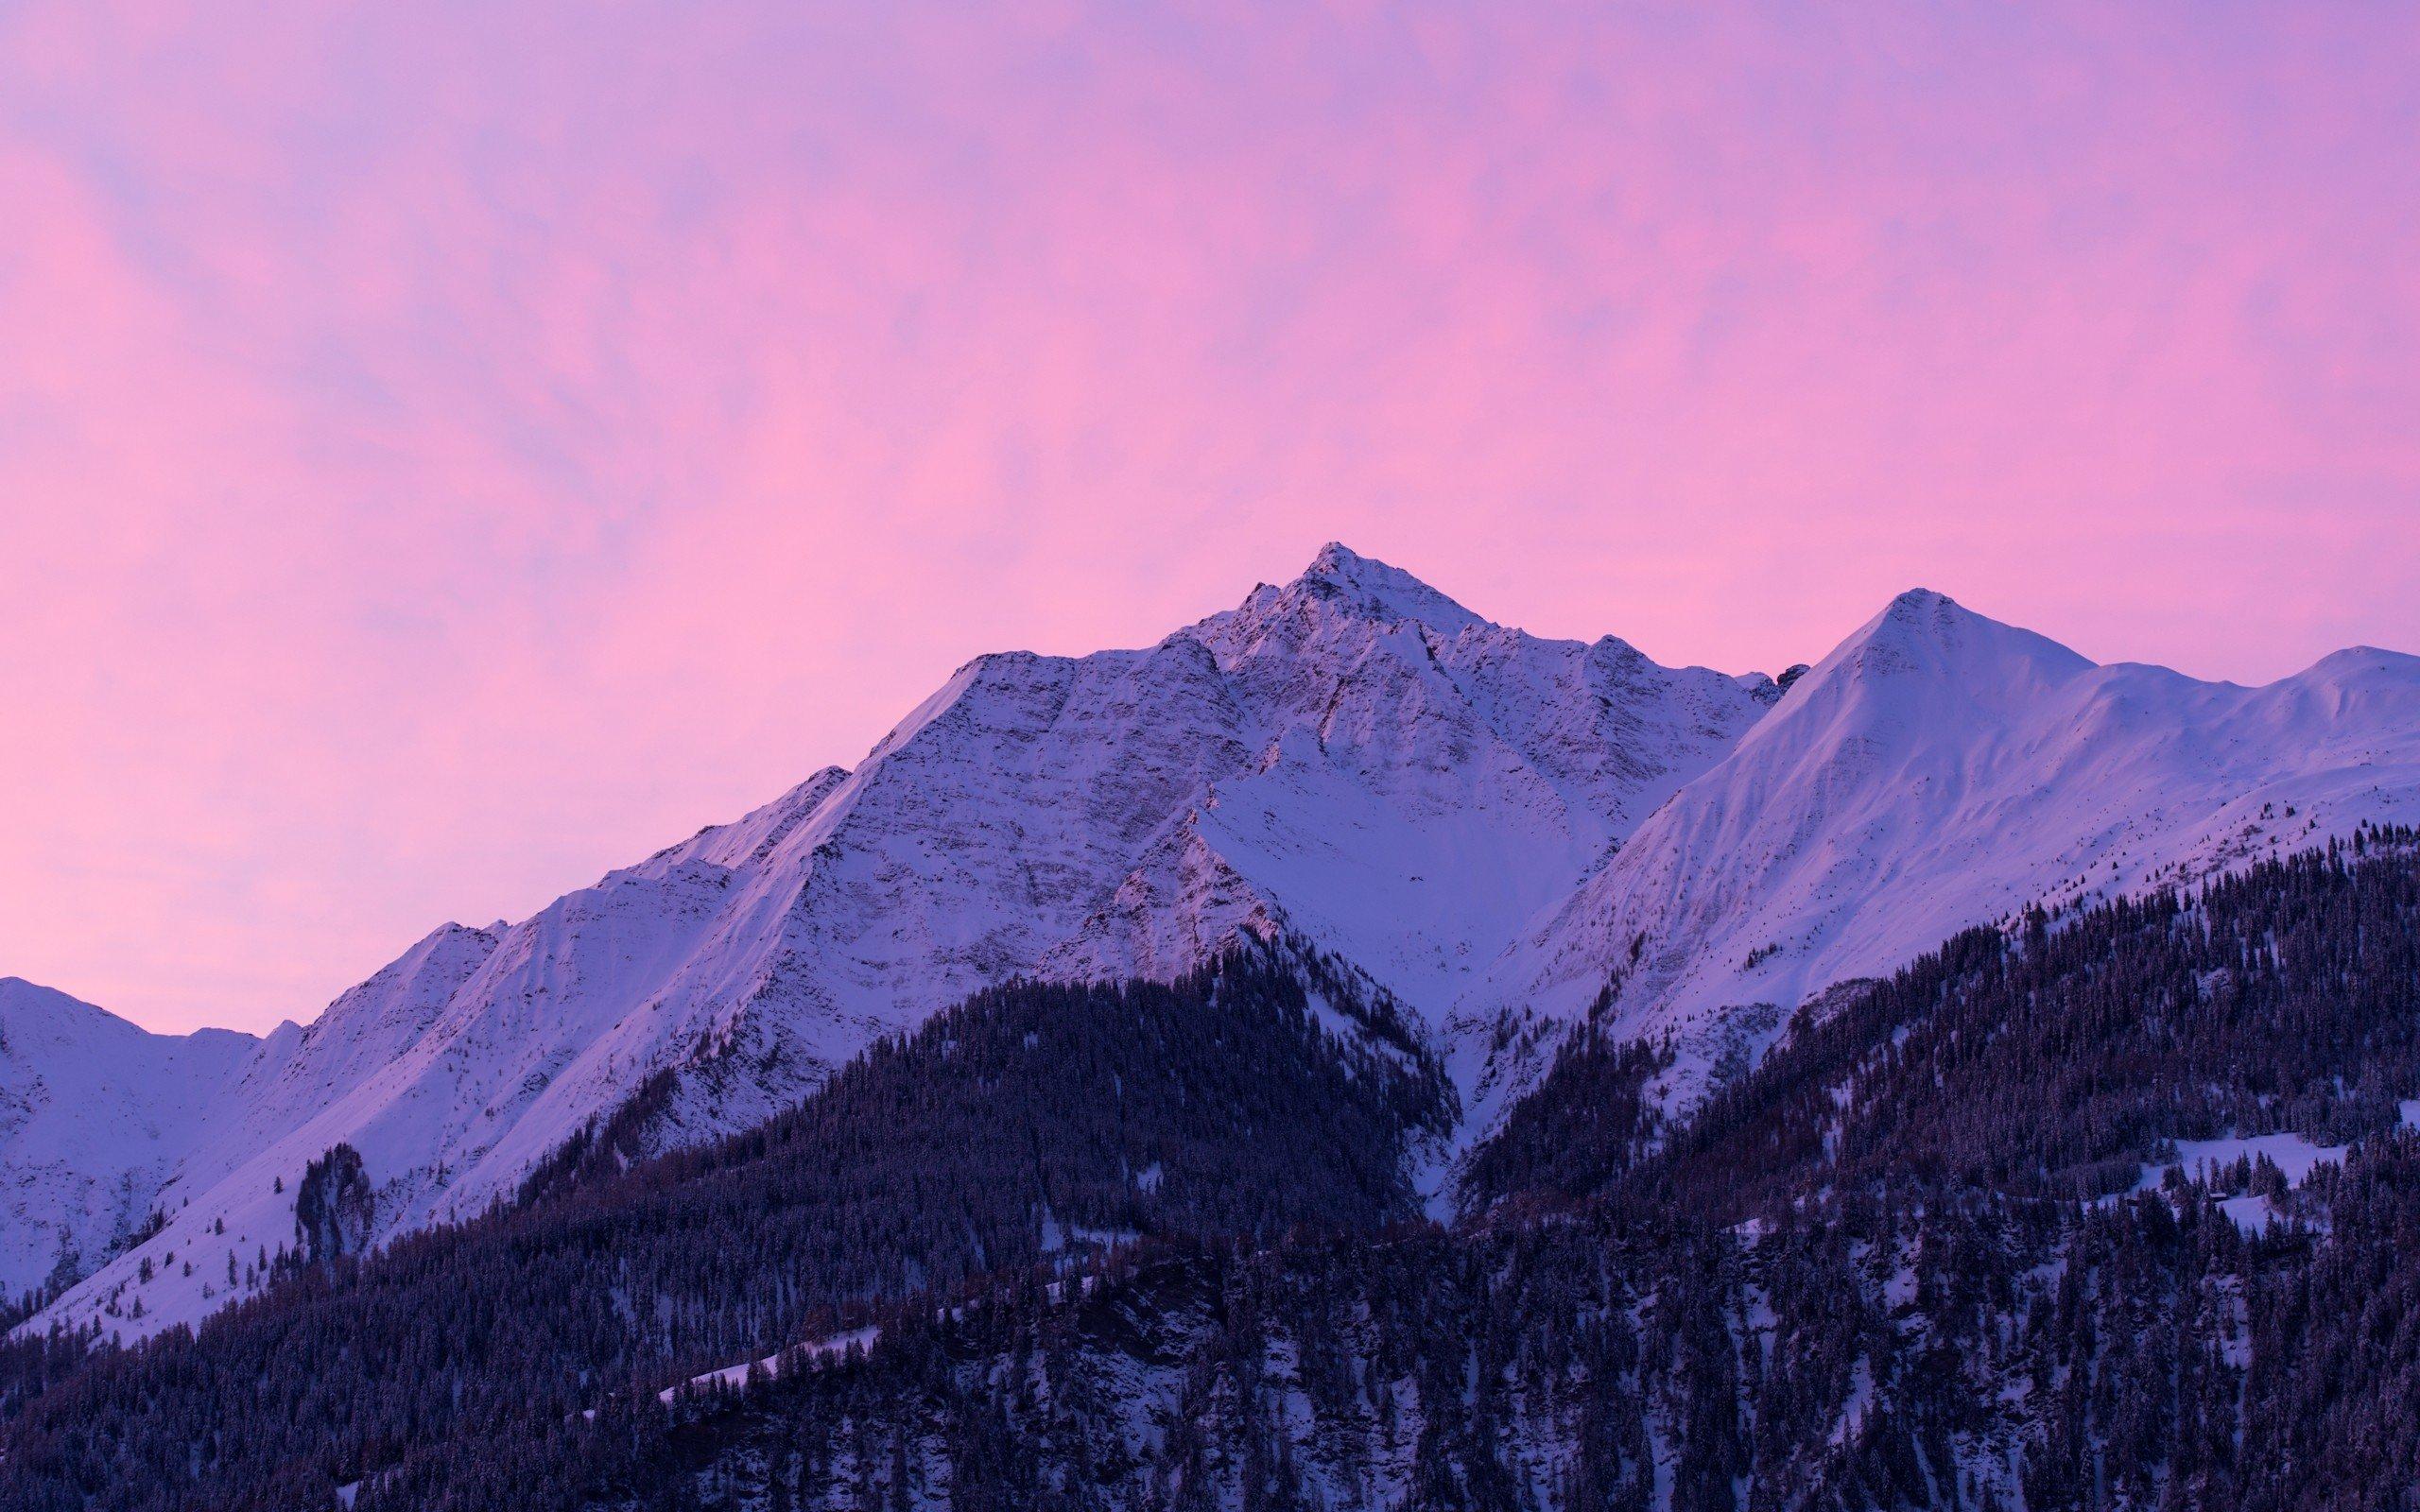 pink snow mountain wallpaper - photo #3